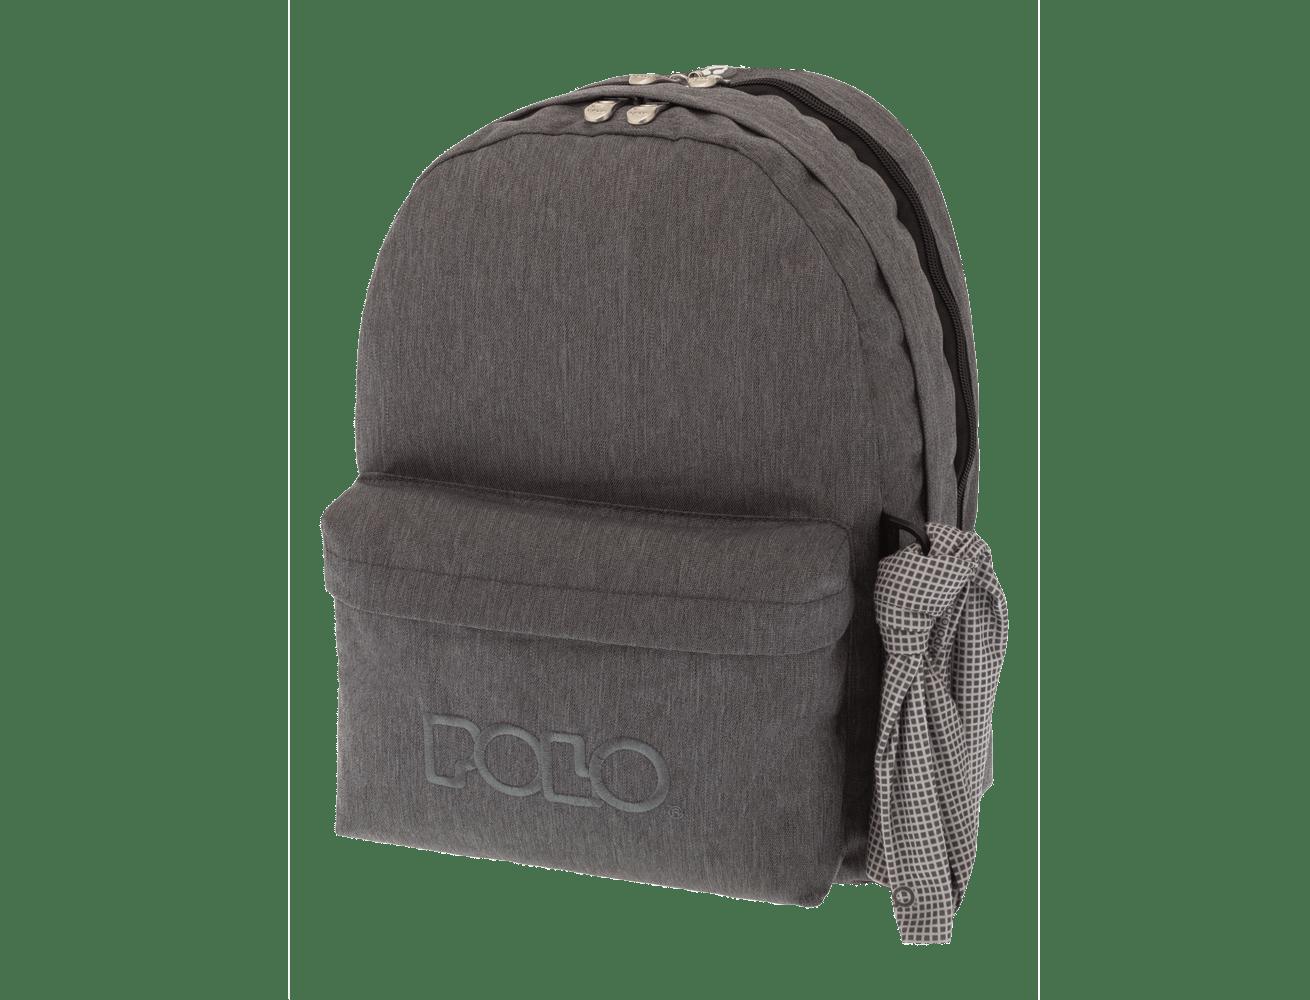 e4aeacd7fd Σχολική τσάντα Polo Jean Style 9-01-235-90 - Lexicon Shop